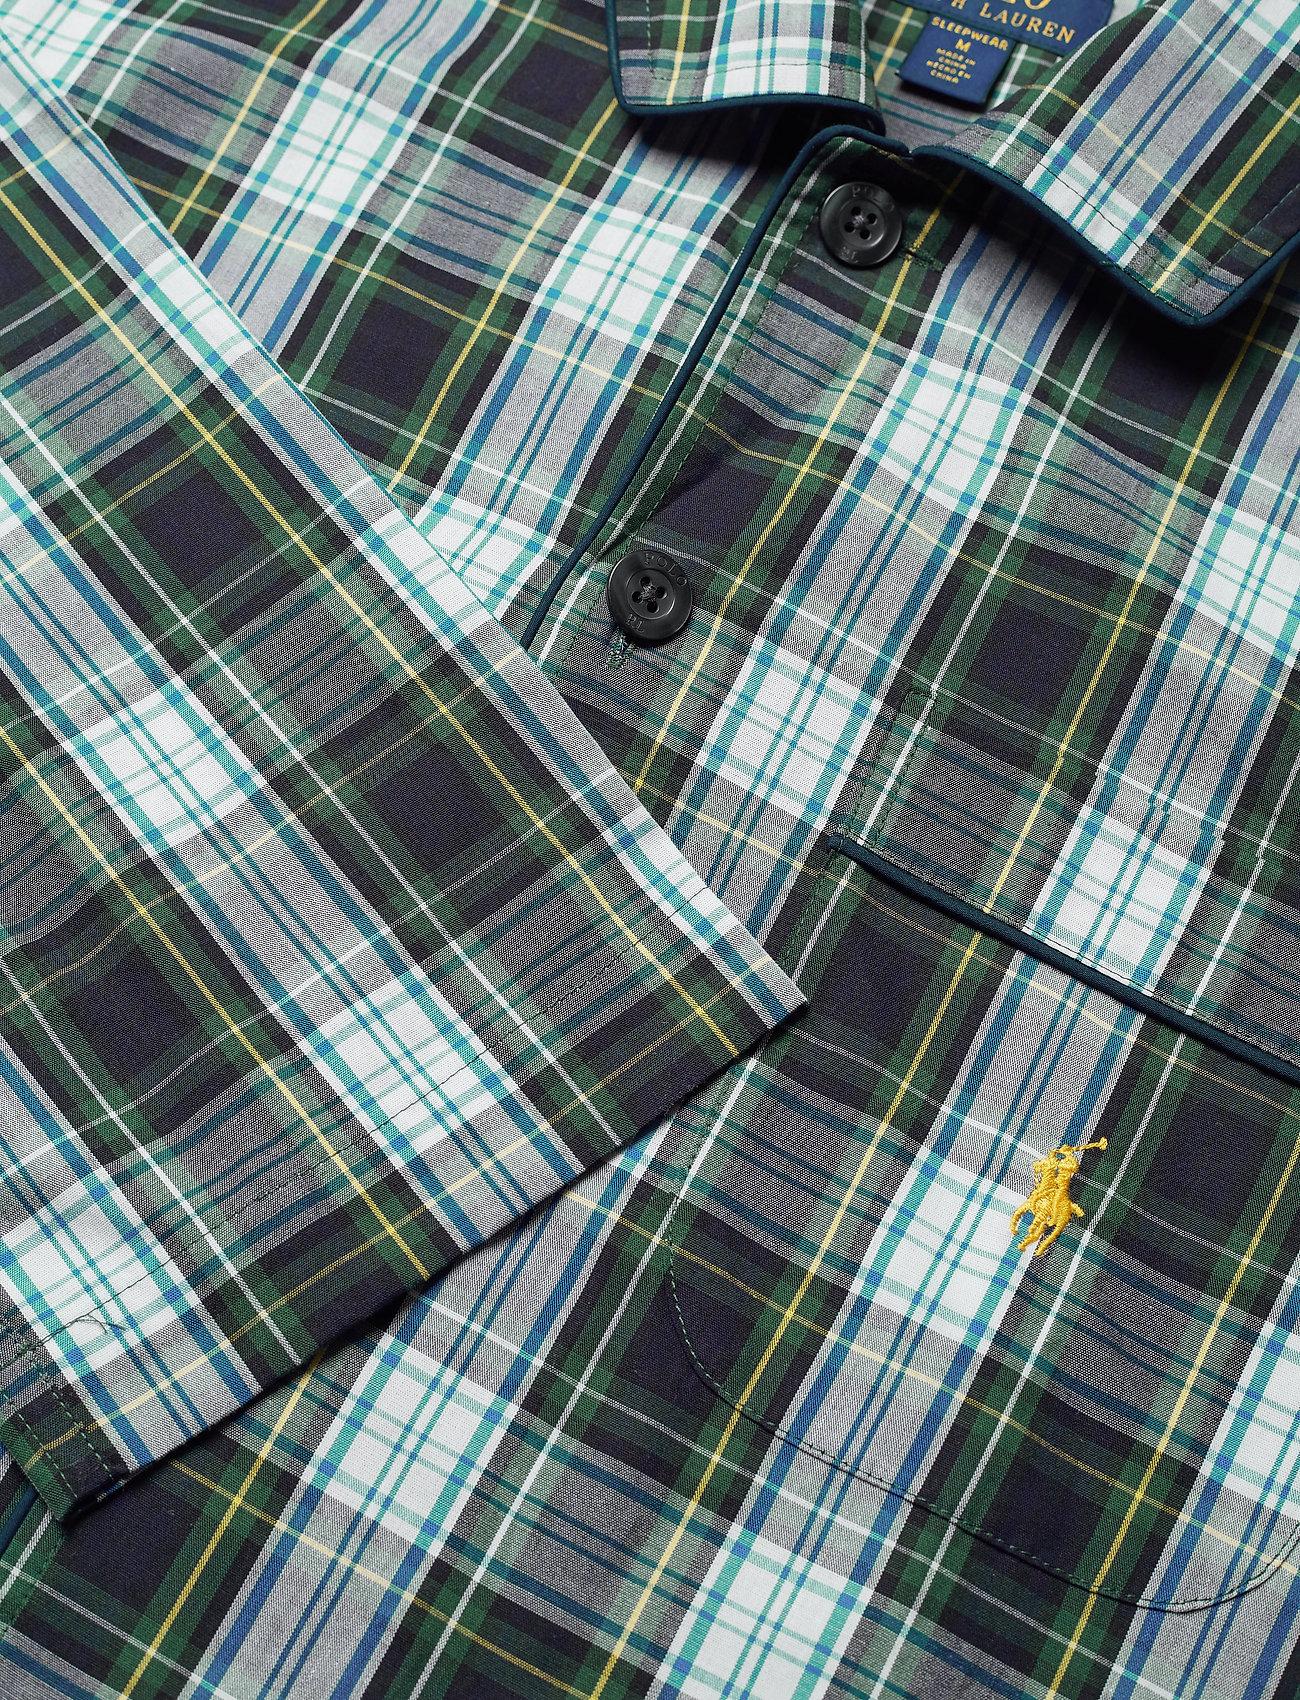 Ralph Lauren Underwear PlaidPolo Cotton Setwales Sleep 1KJ3lcTF